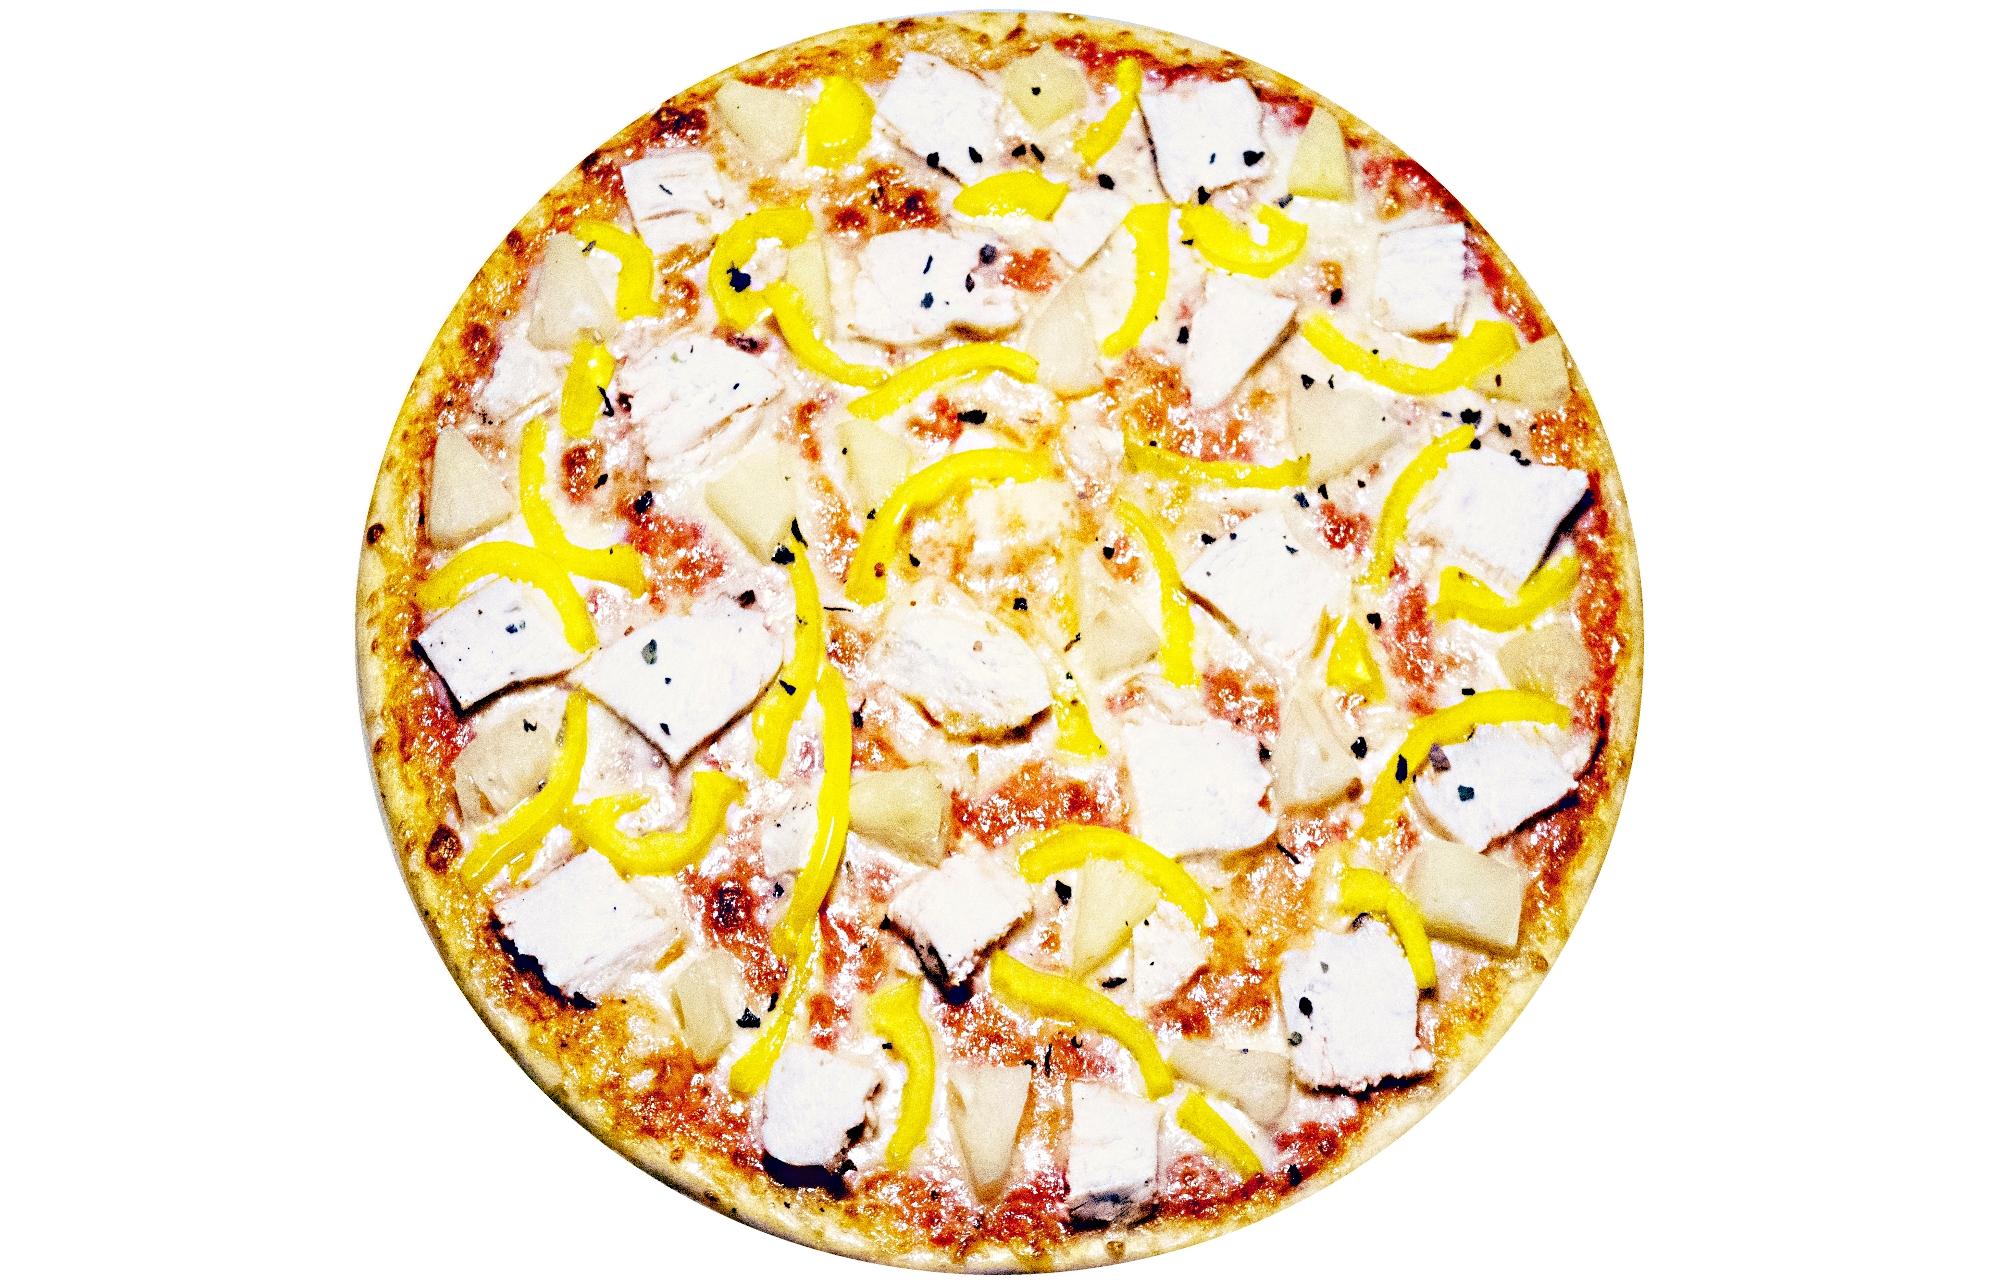 palermo_pizza_urbanfood_by